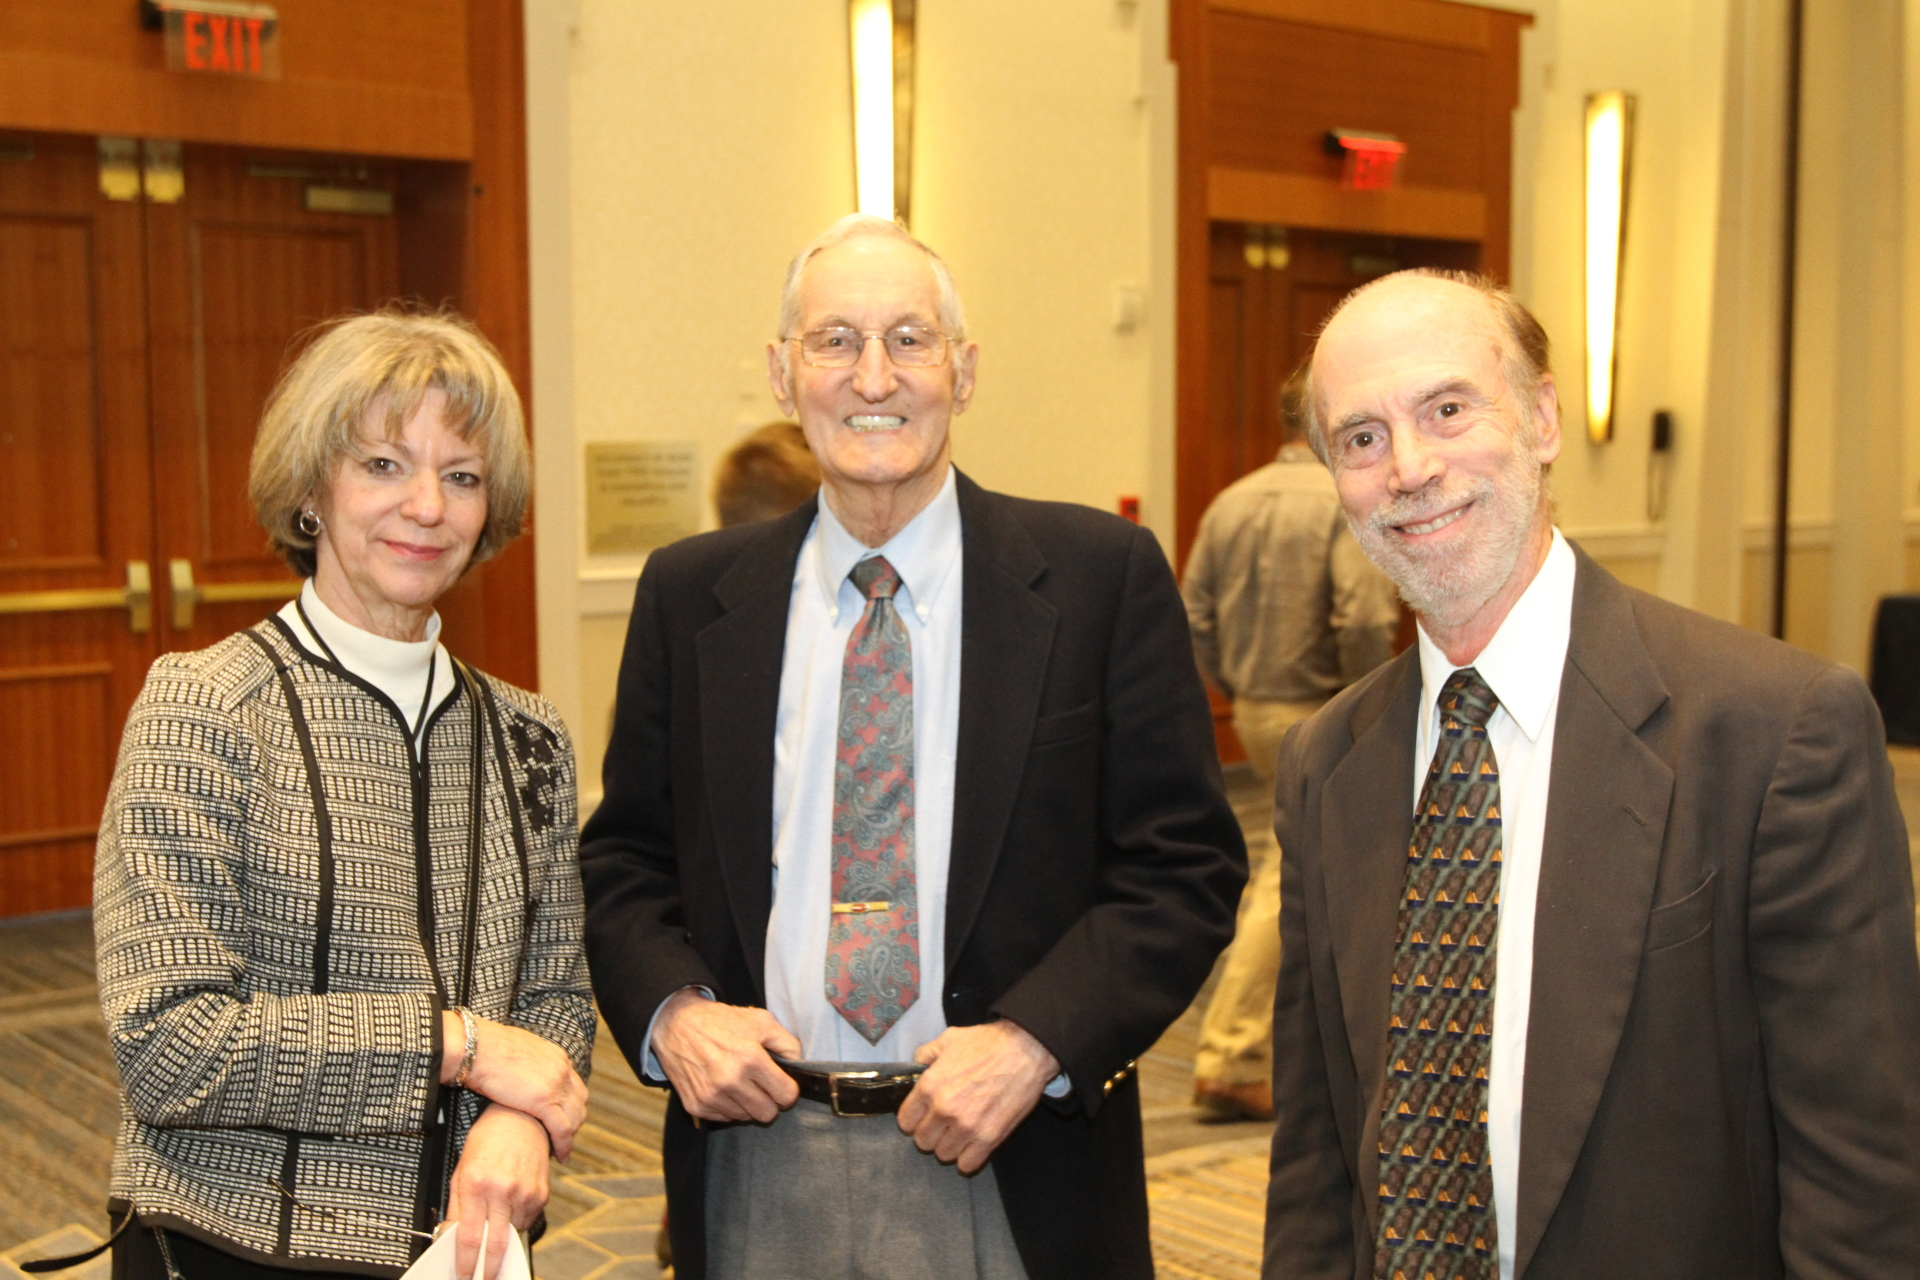 Vickie Kuziak, Paul Benoit, and Luke Williams